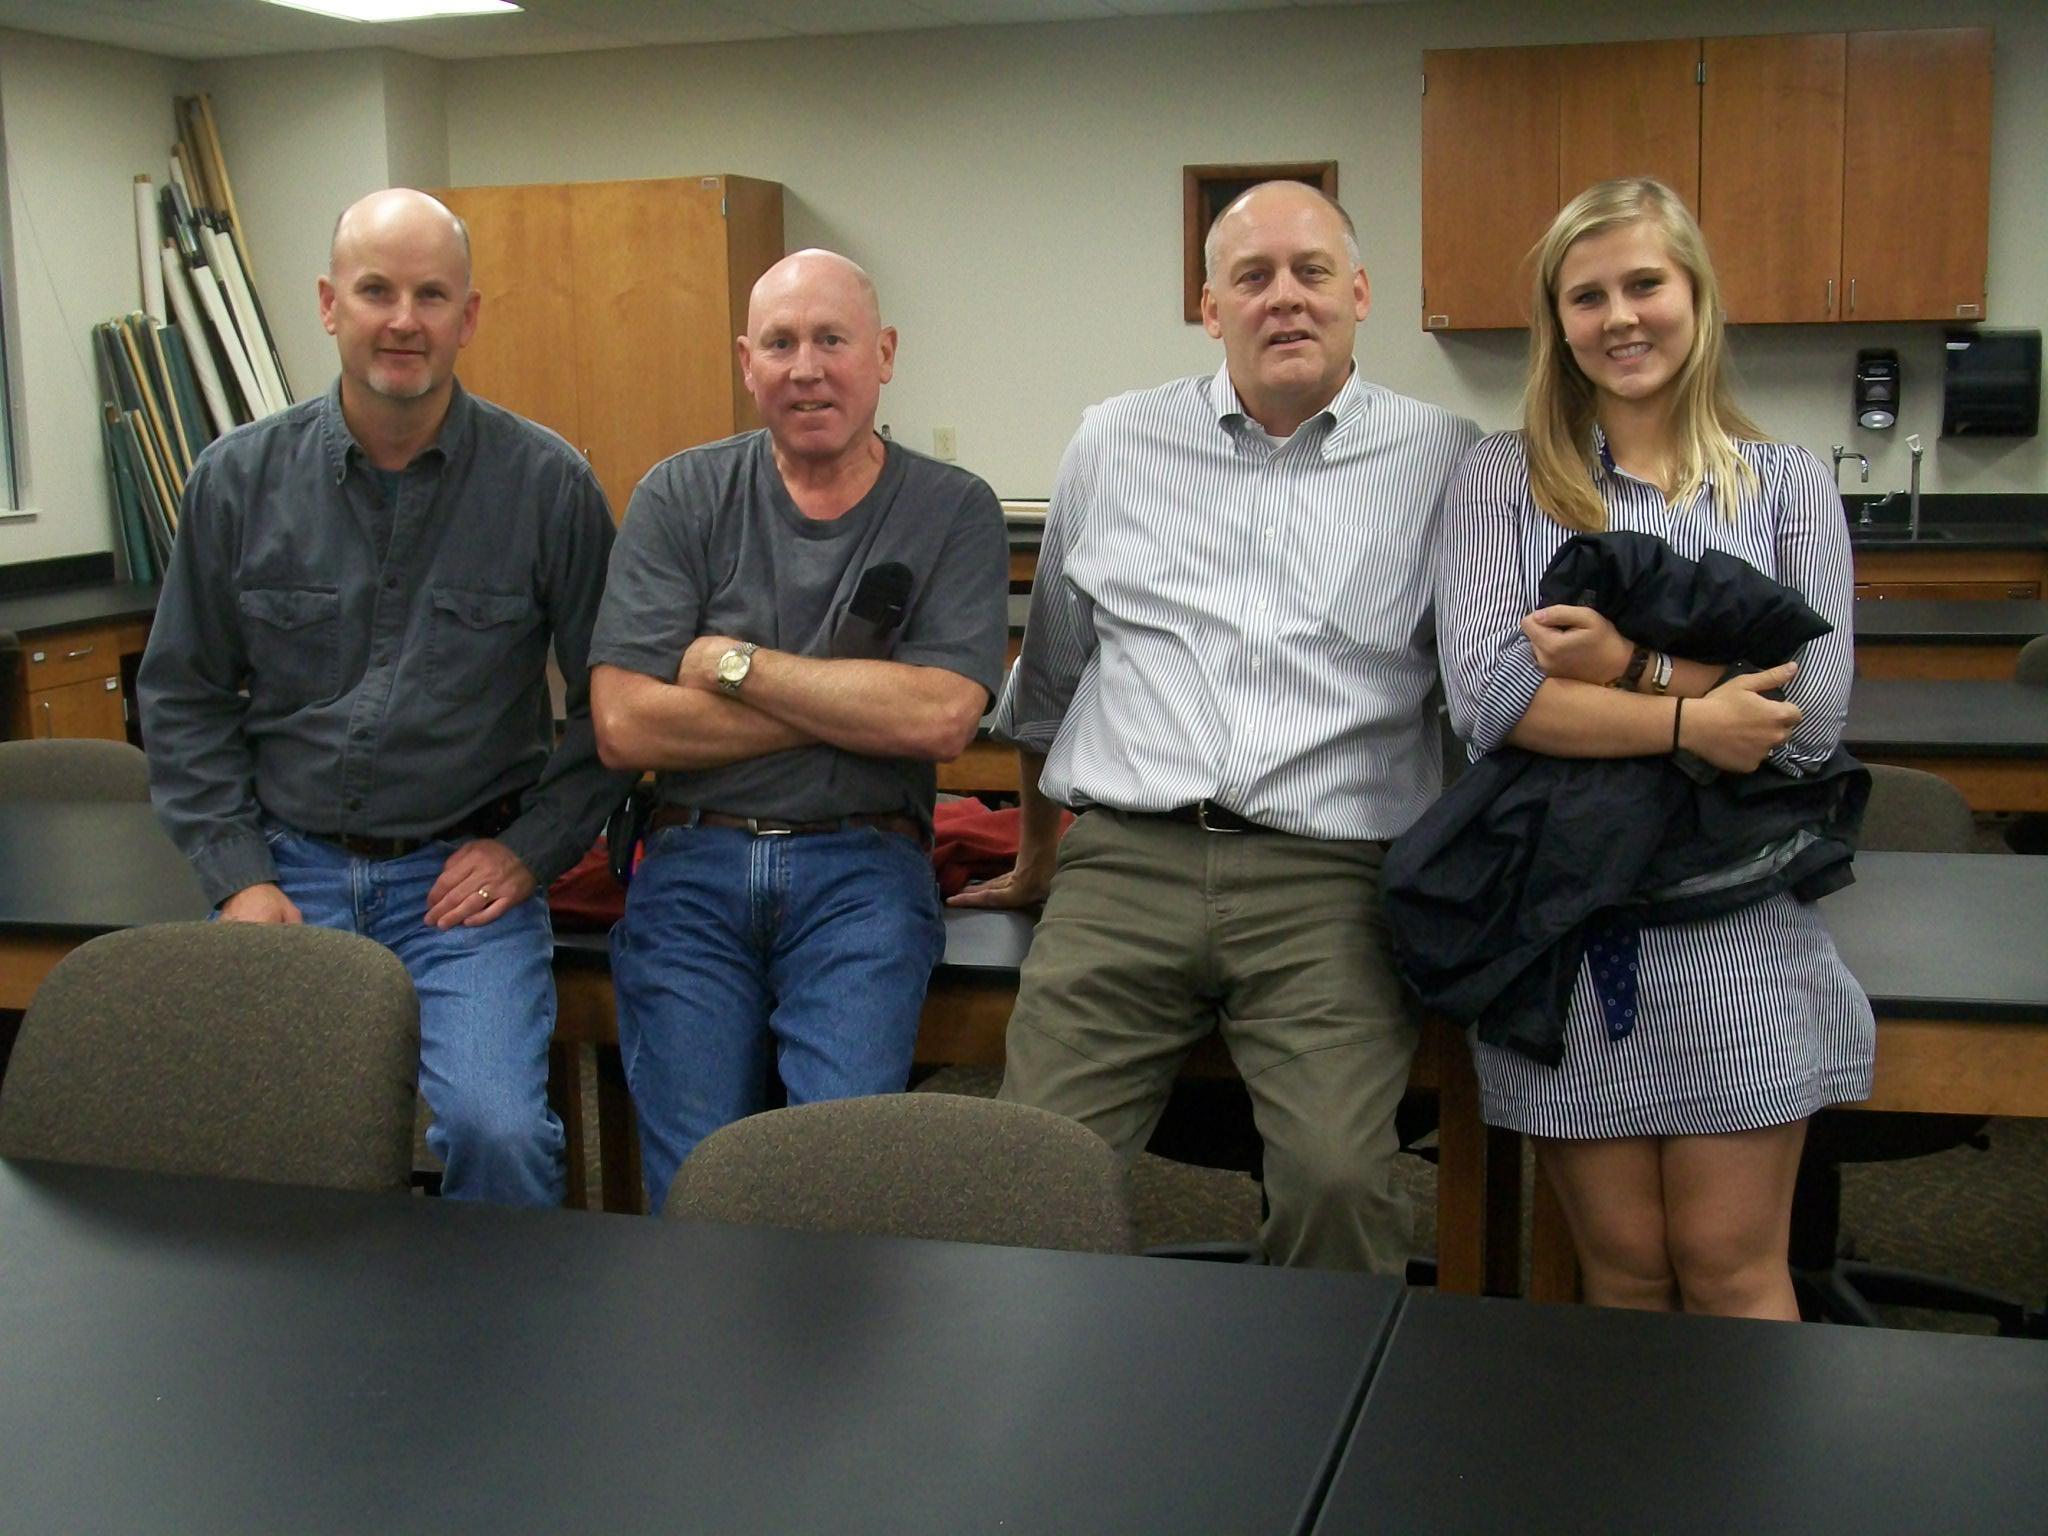 Wilkerson, Soster, Davis, daughter